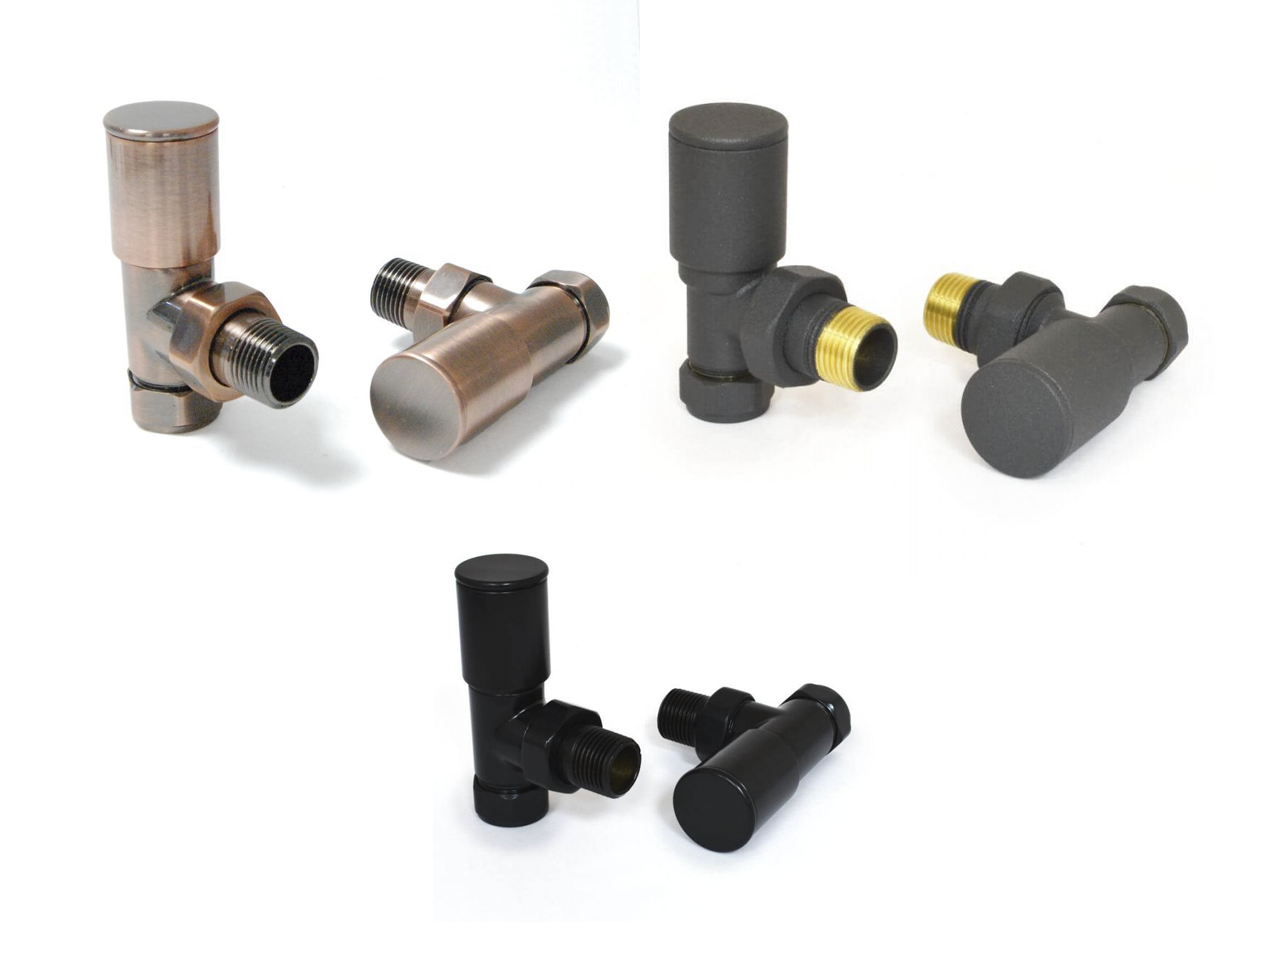 Different radiator valves - Straight, angled and corner